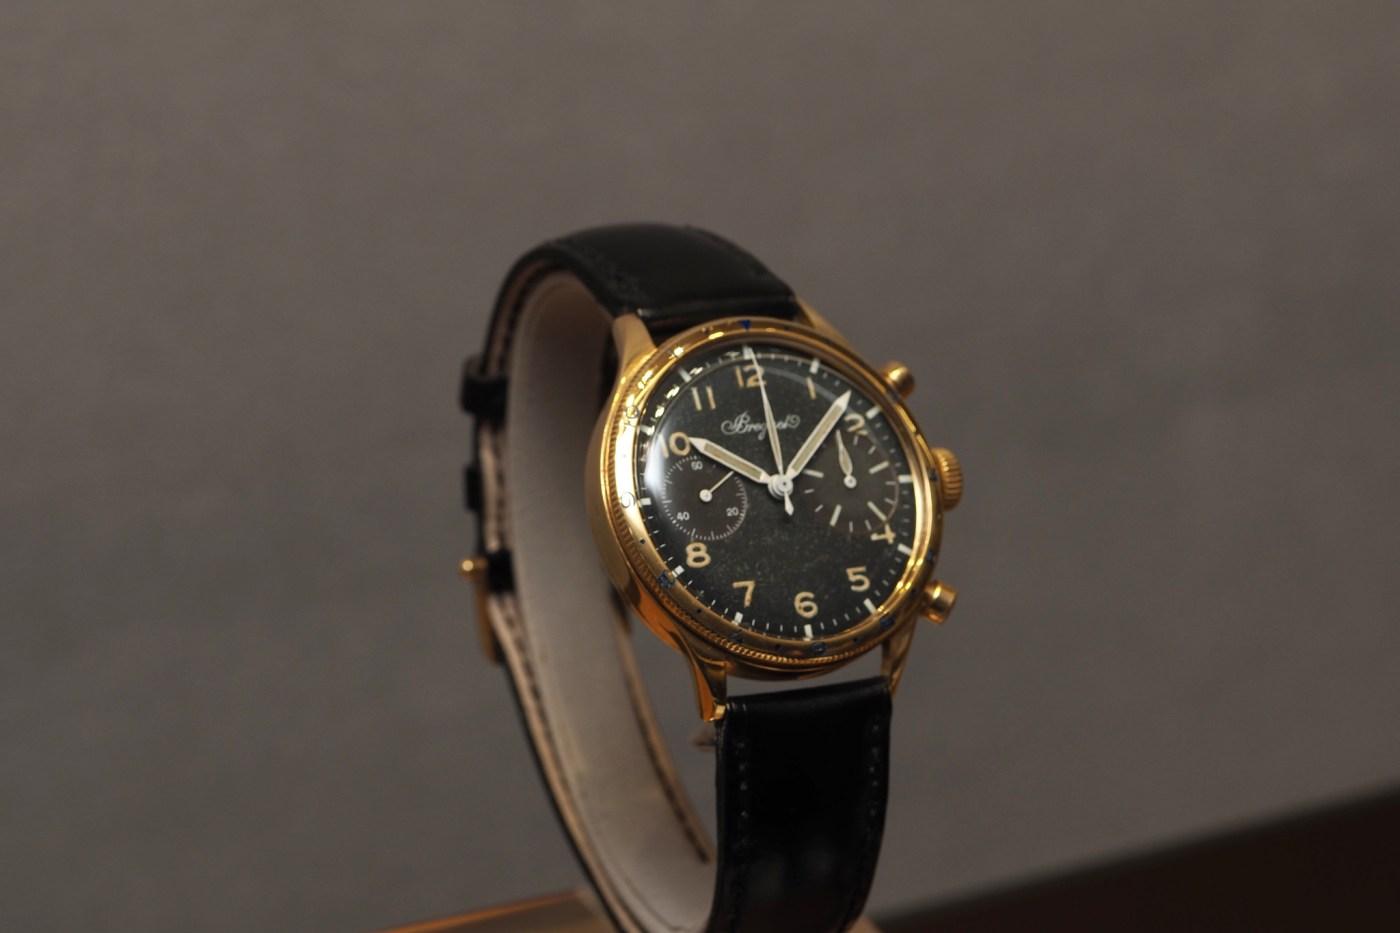 Type 20 wristwatch chronograph, first-generation